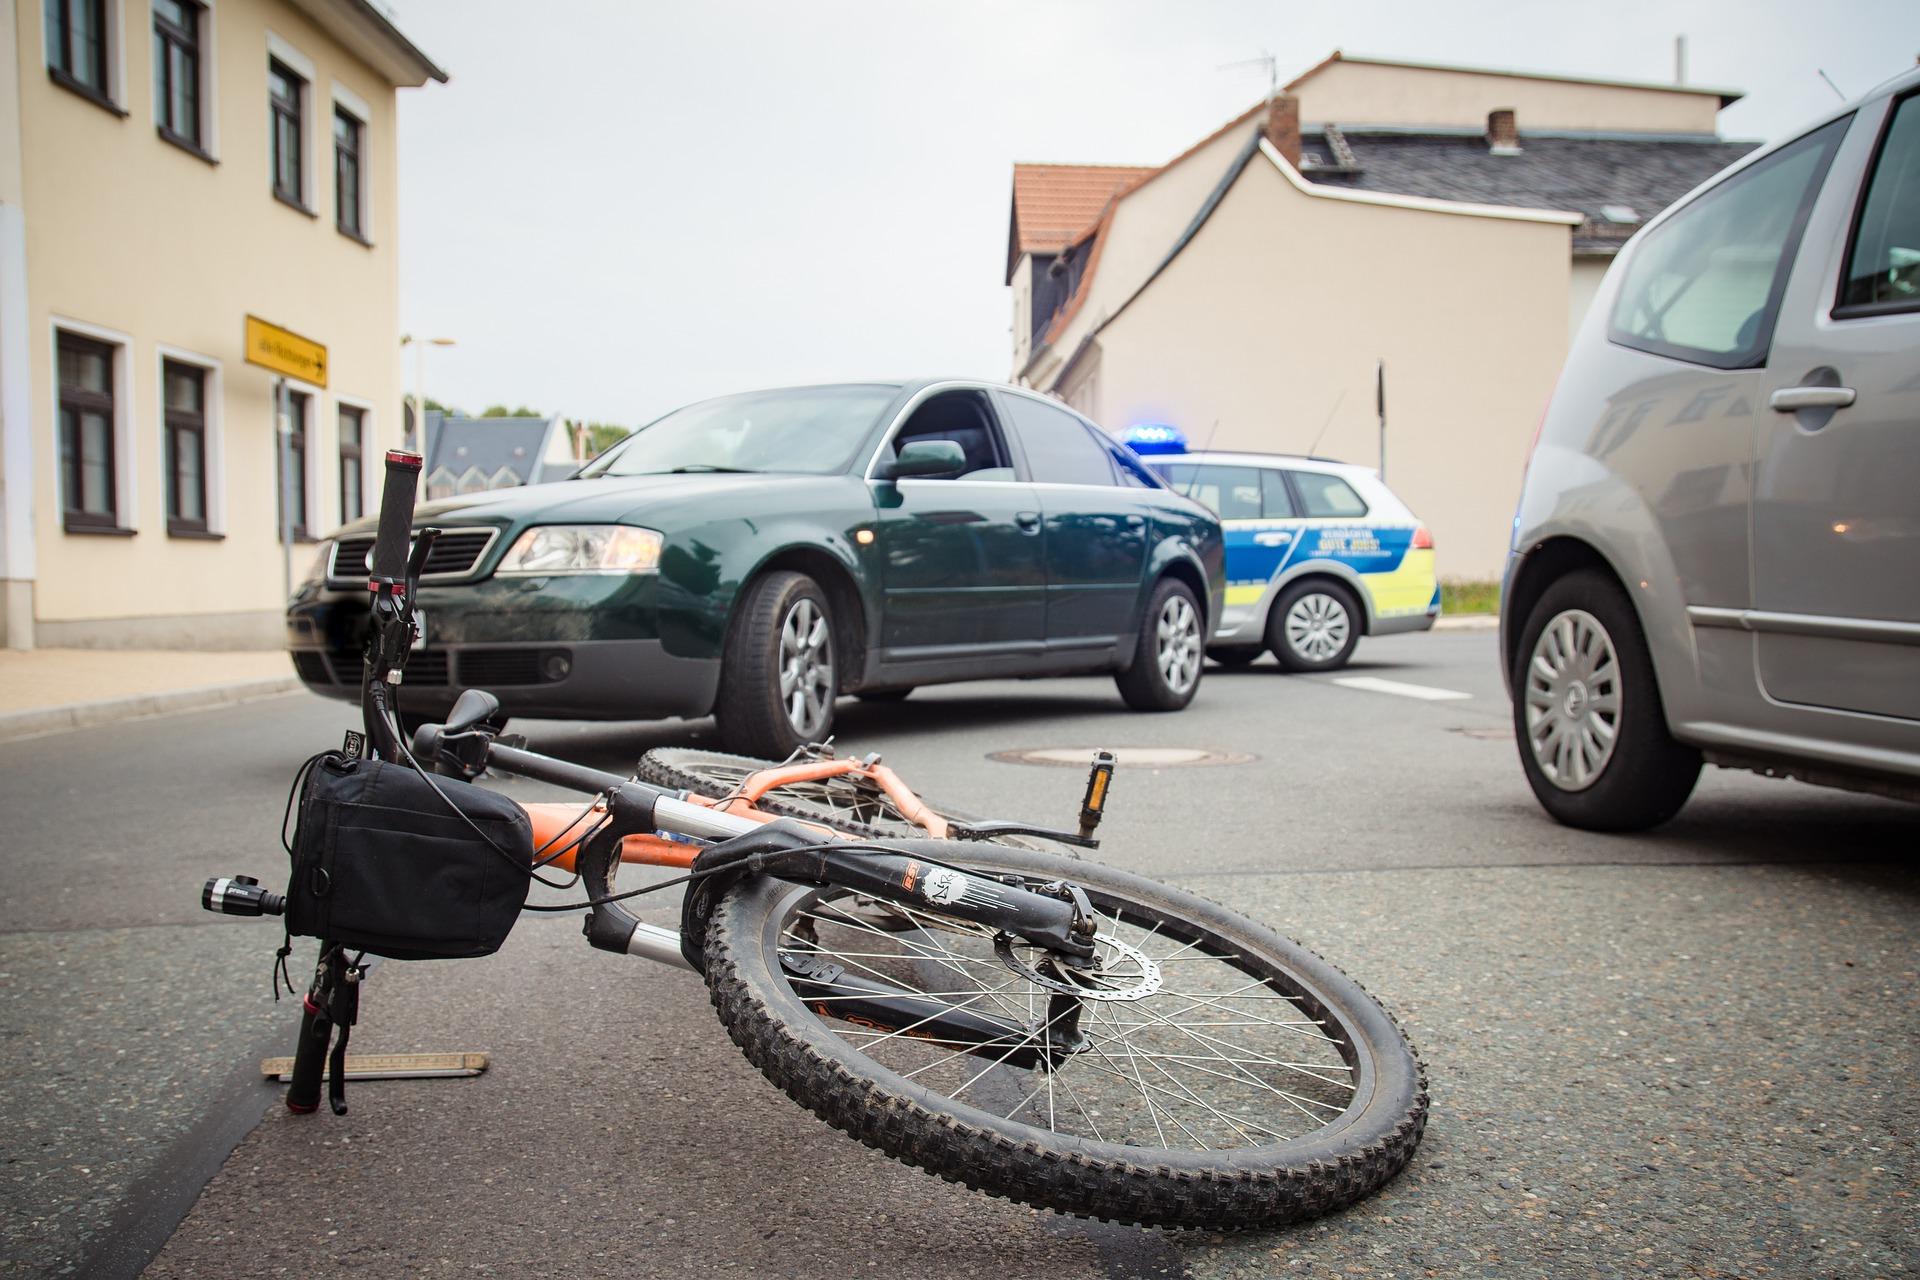 Radweg neben der Fahrbahn: Abbieger müssen warten